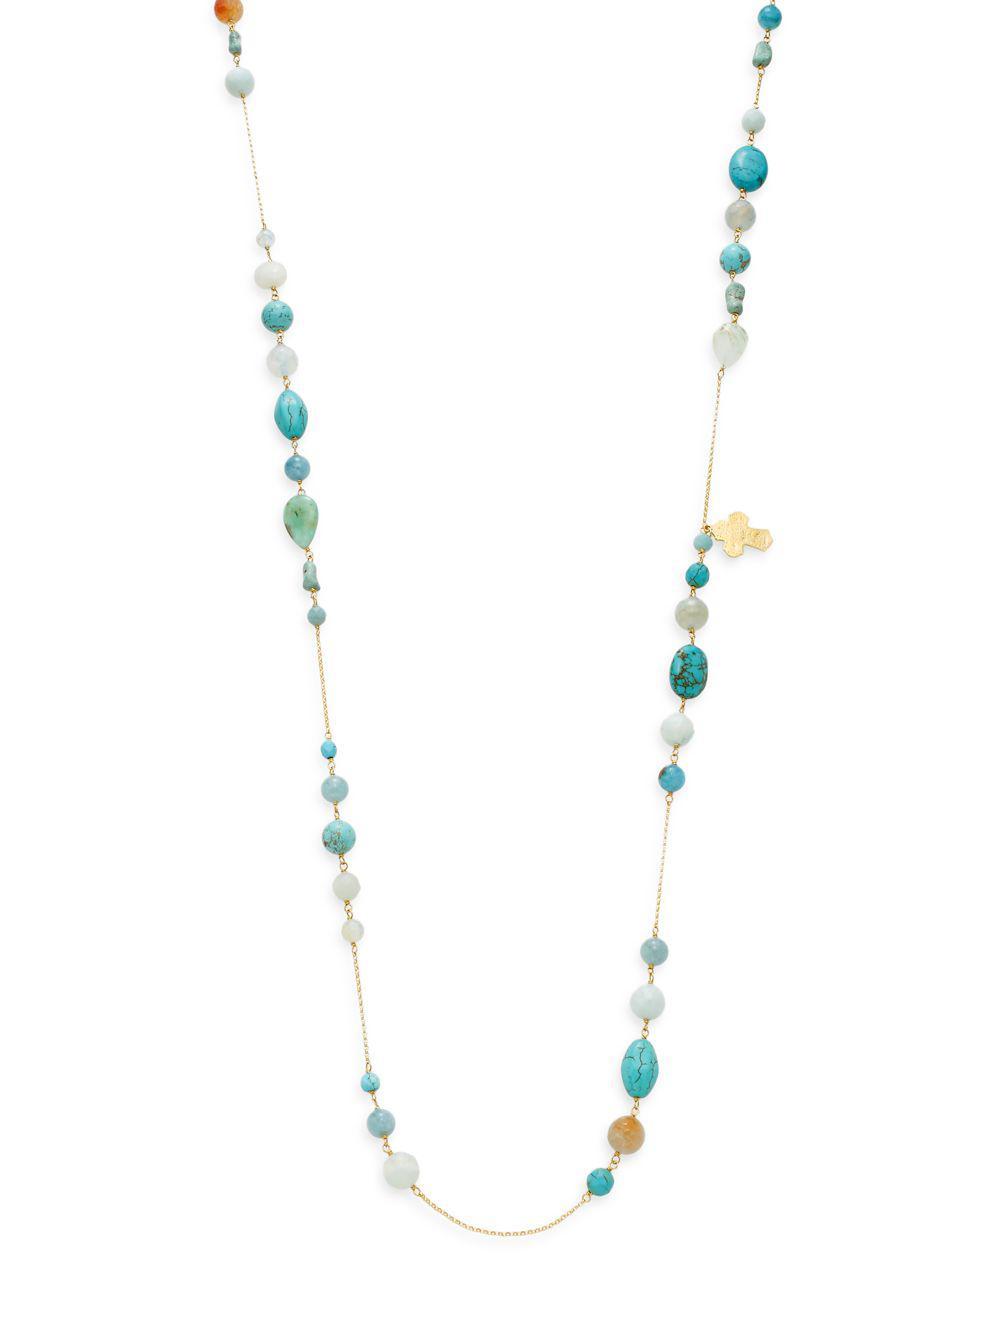 Gold-tone Beaded Necklace - one size Chan Luu 8MfuJ1